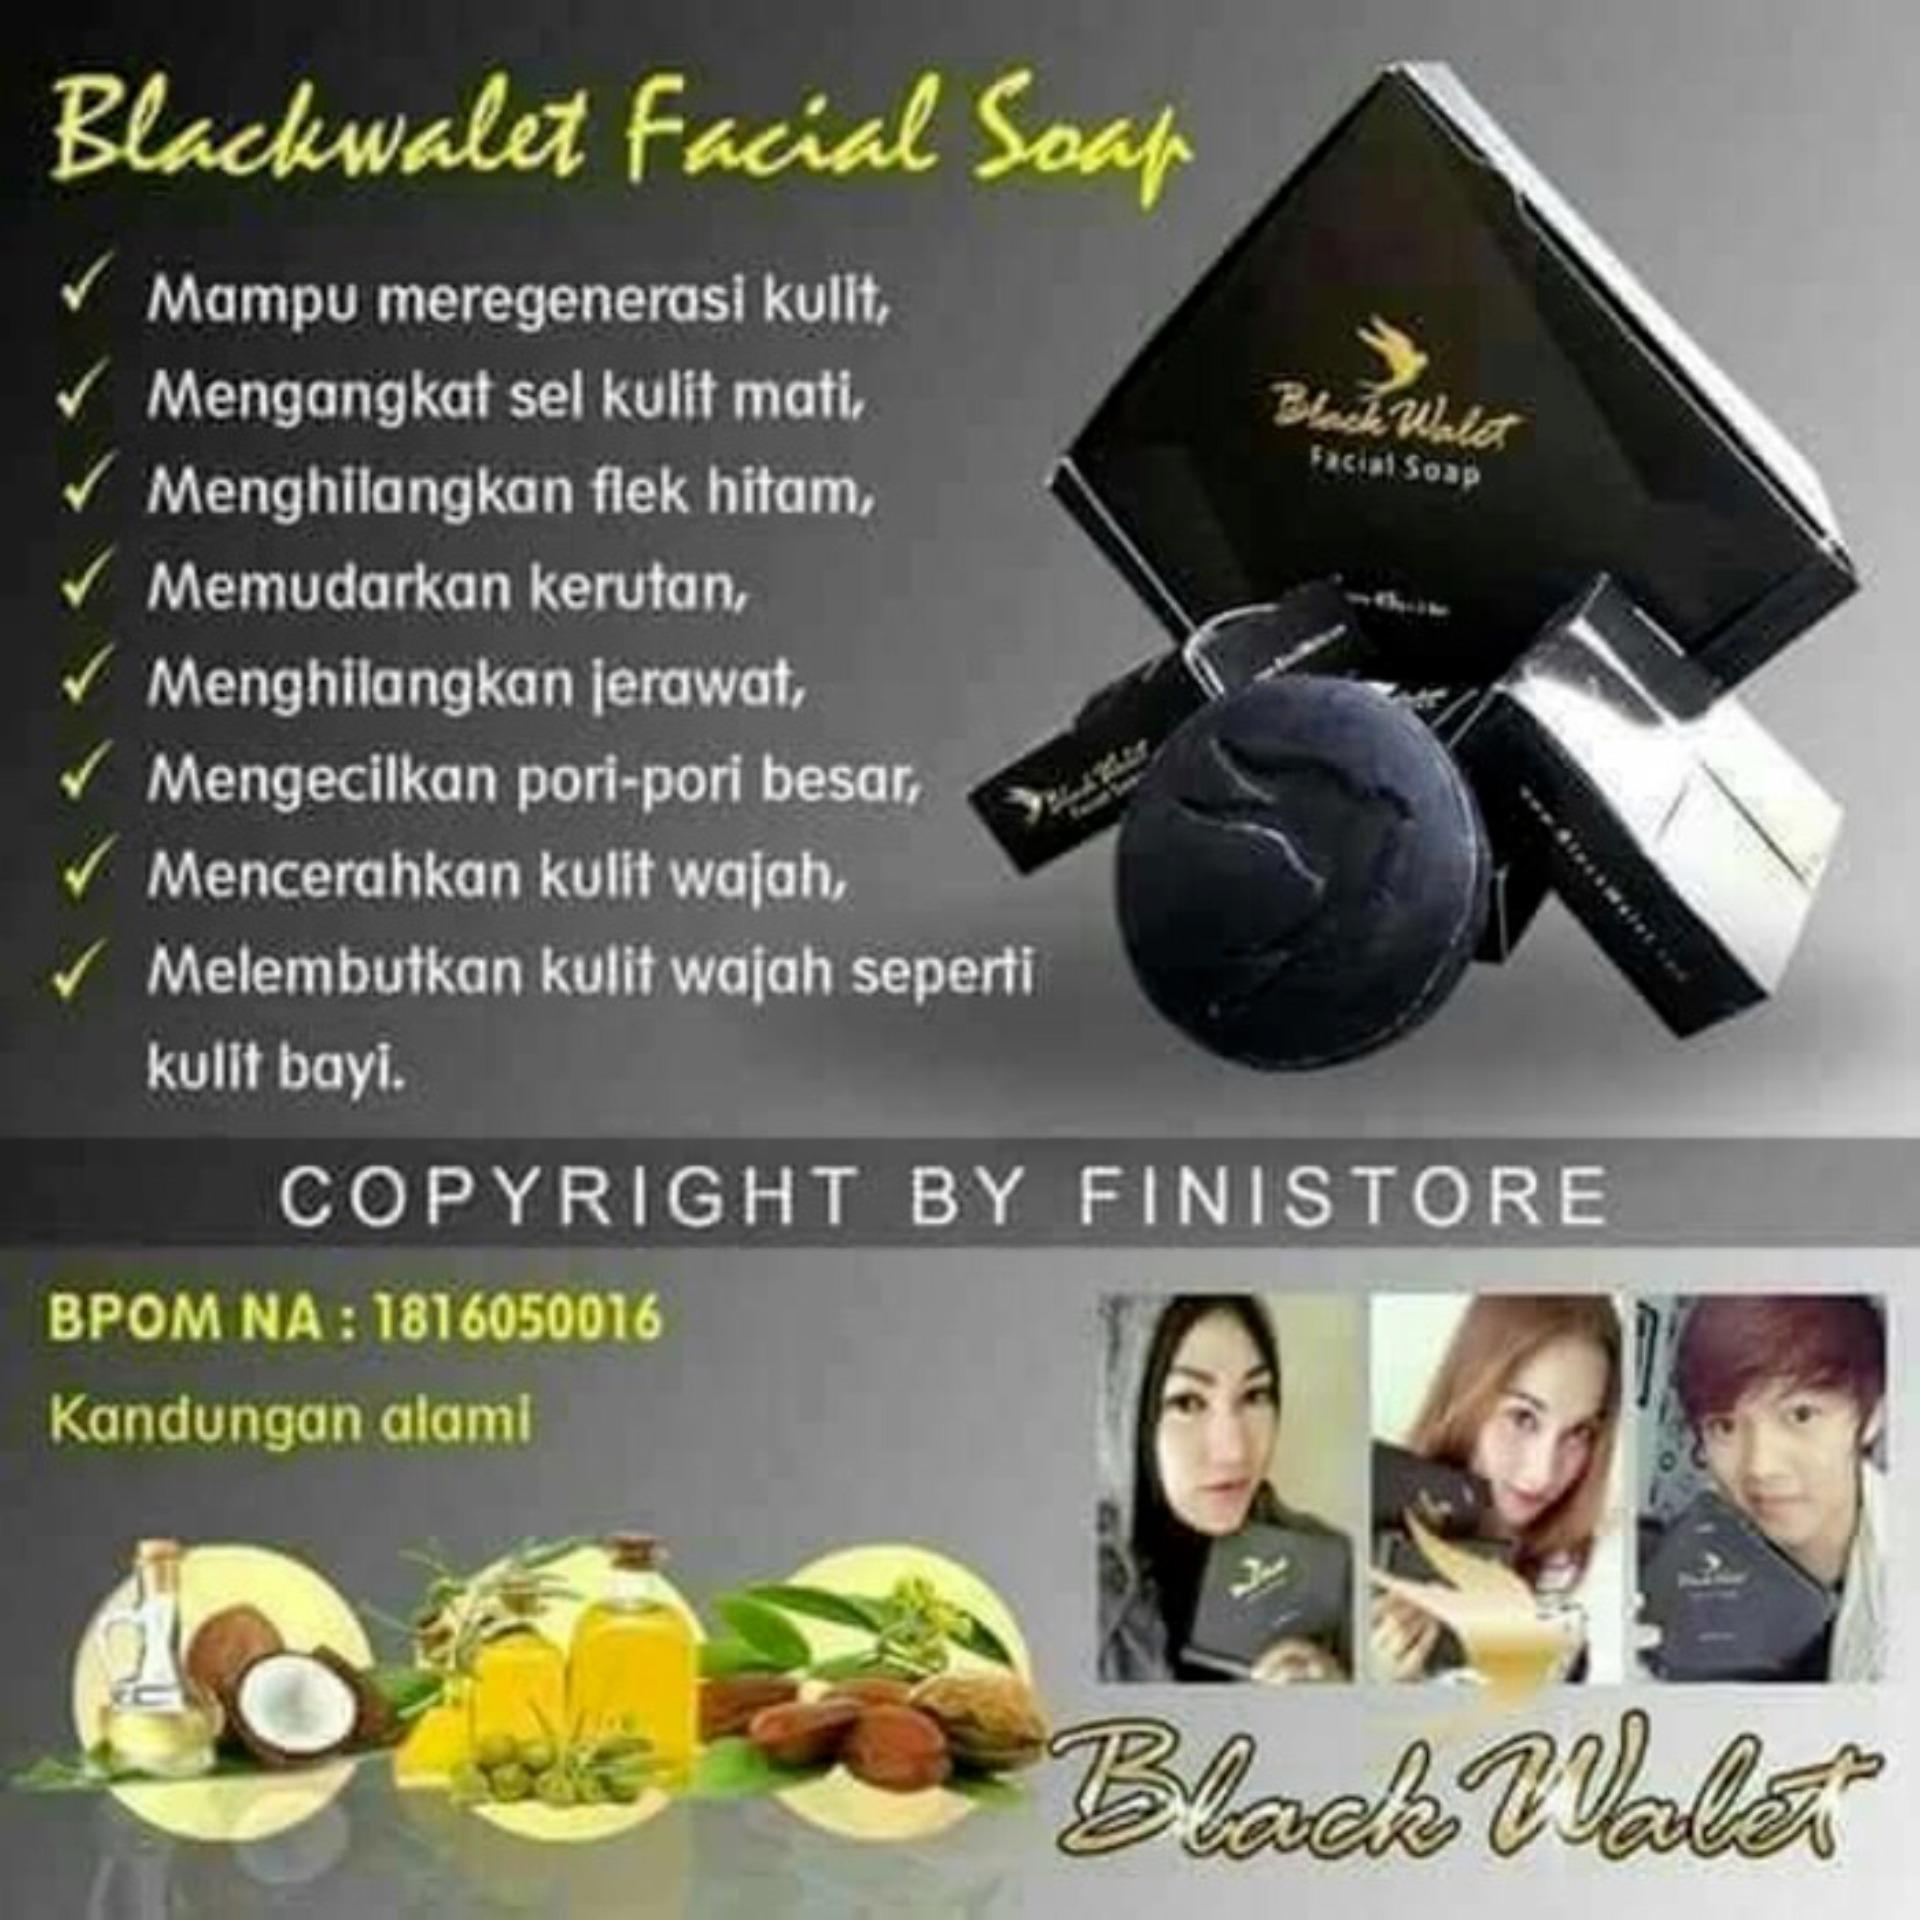 ECER BLACK WALET SOAP BOX DIAMONT sabun walet hitam asli bpom